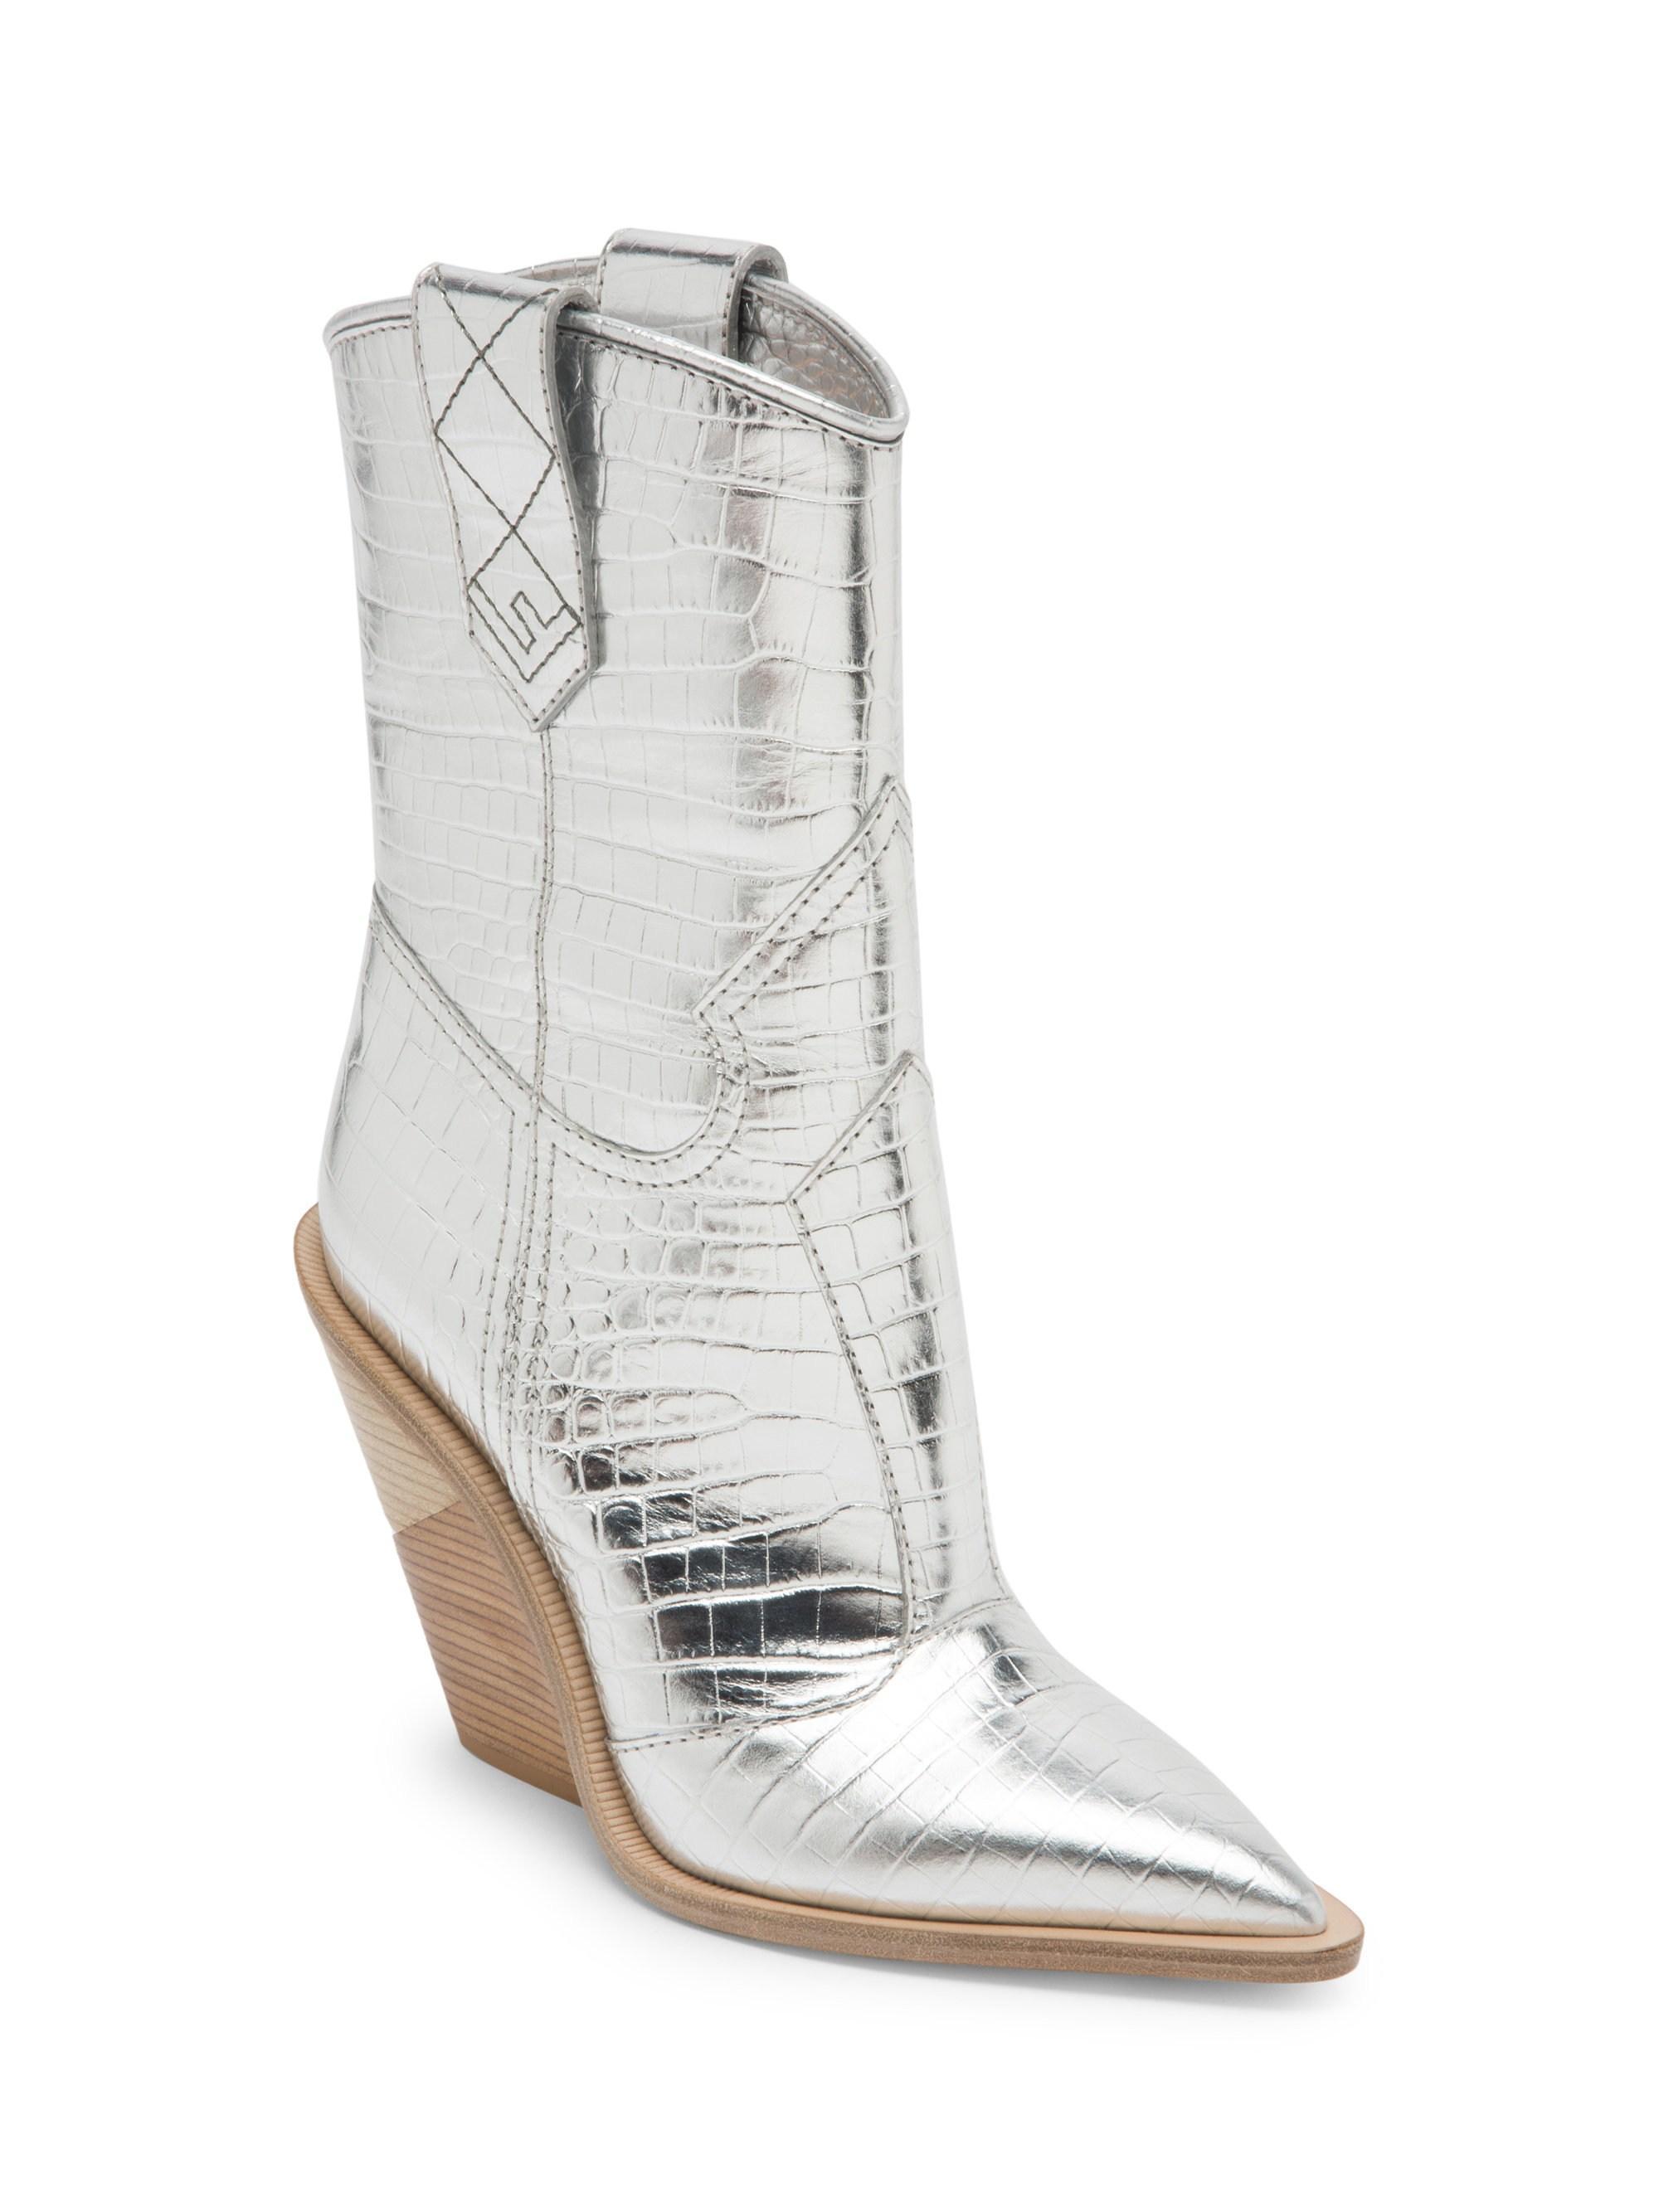 Fendi Leather Women's Metallic Cowboy